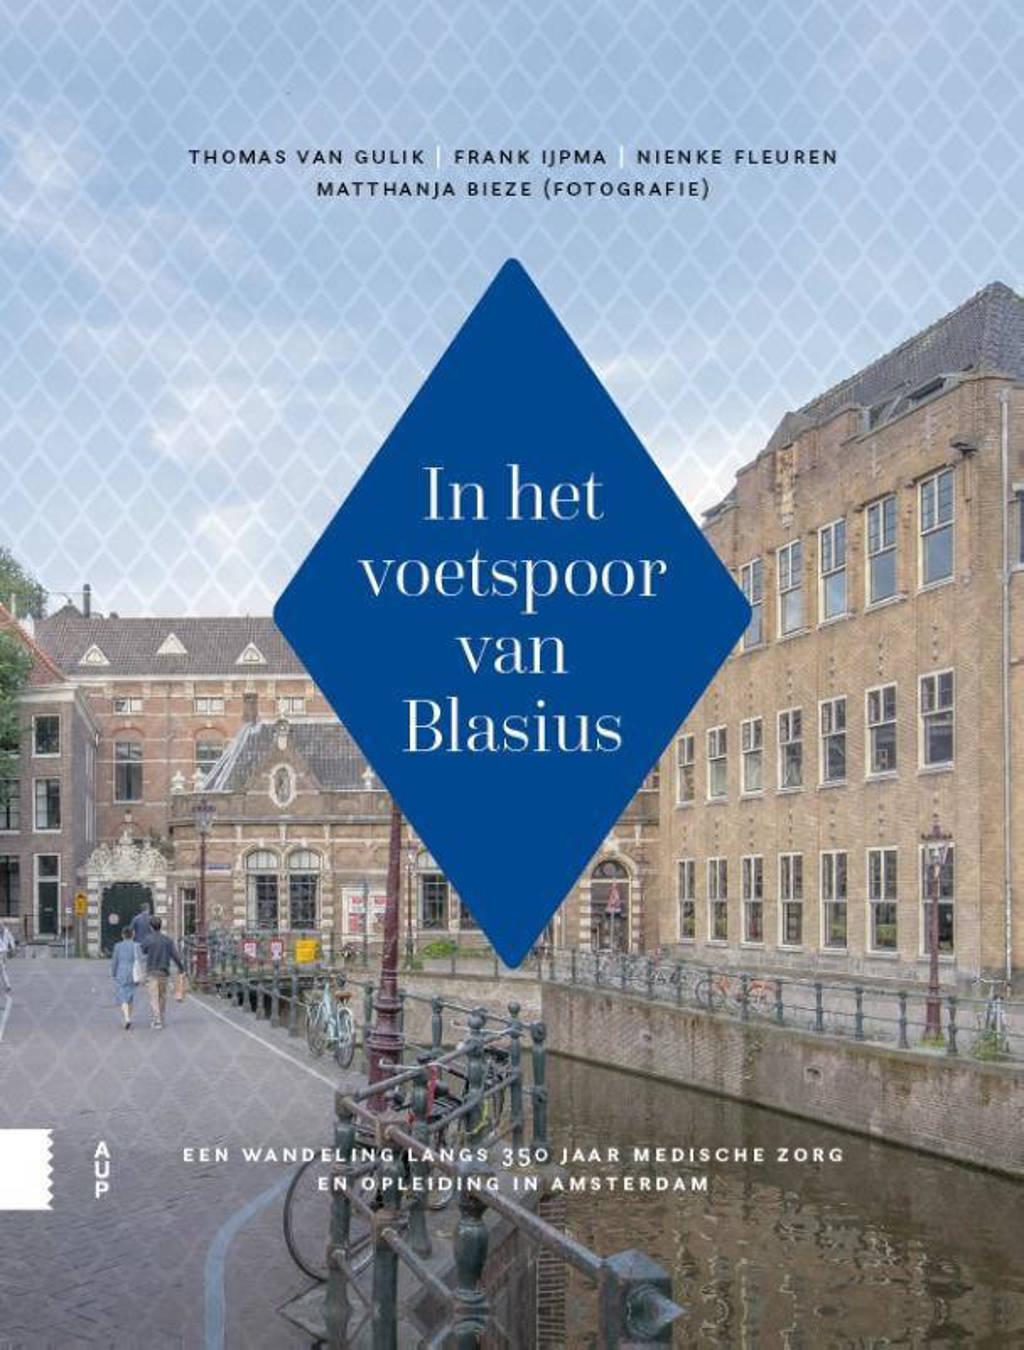 In het voetspoor van Blasius - Thomas van Gulik, Frank IJpma, Nienke Fleuren, e.a.